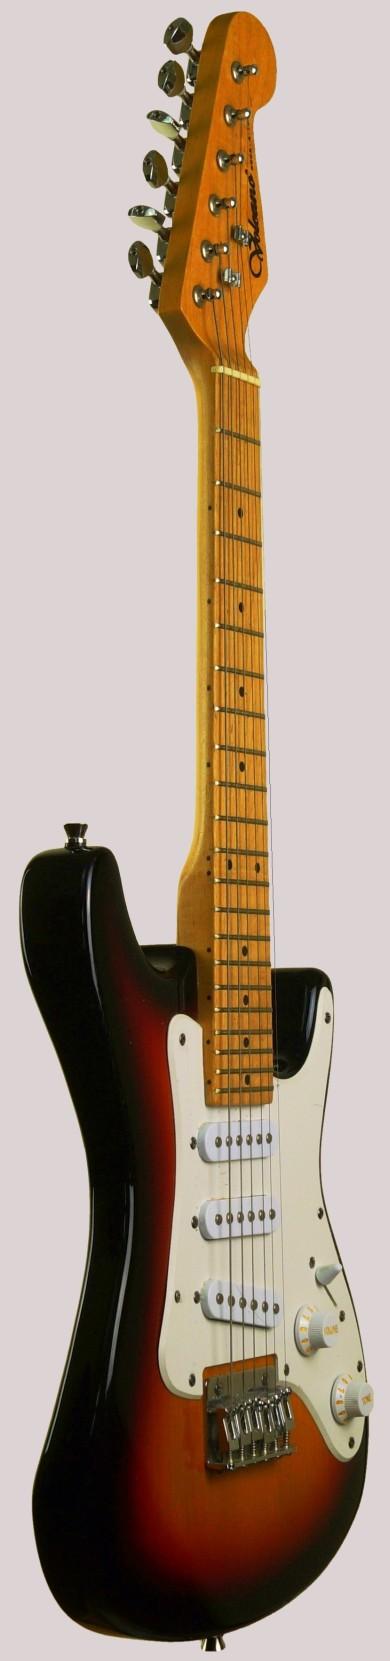 Volcano rock-a-teer mini guitar strat guitalele at Ukulele Corner